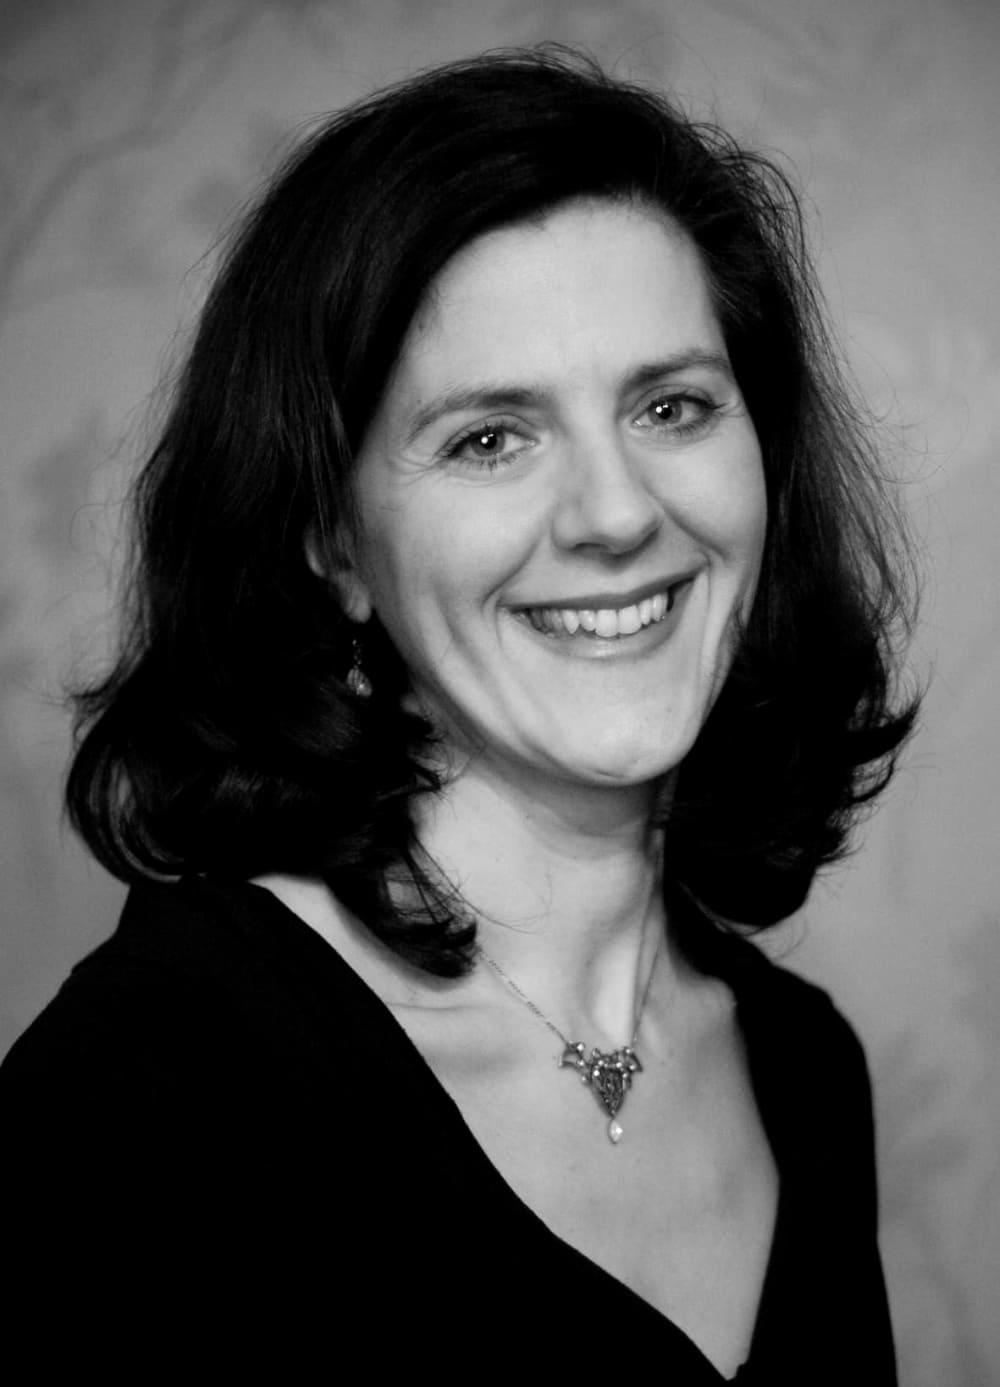 Portrait Elisabeth Eberle